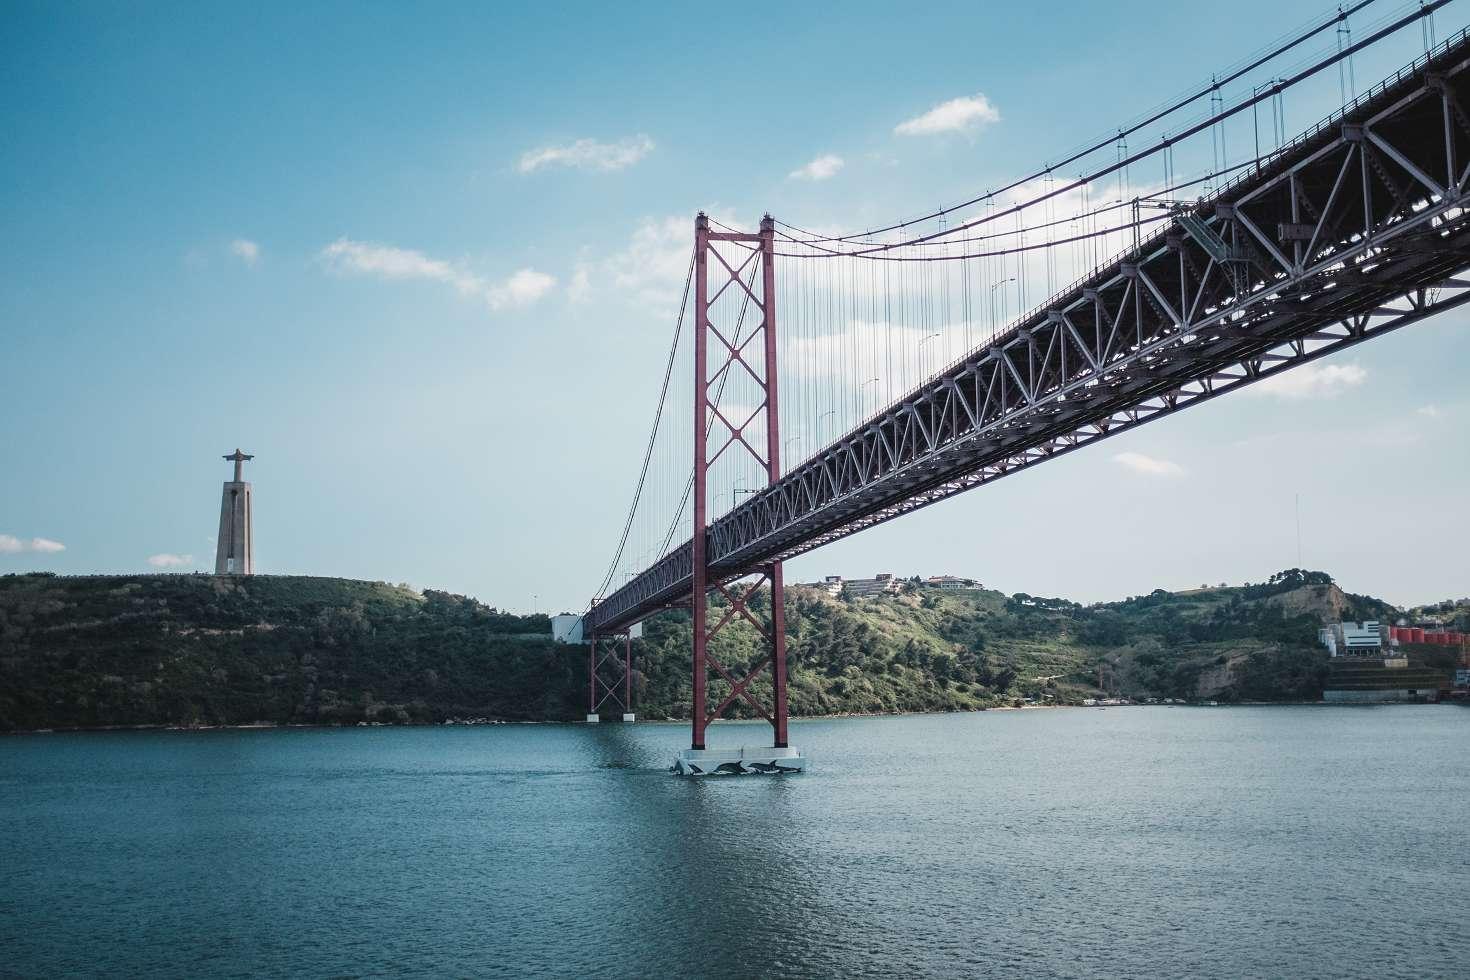 Valencia-Lissabon-Vigo-Stonehenge (53)